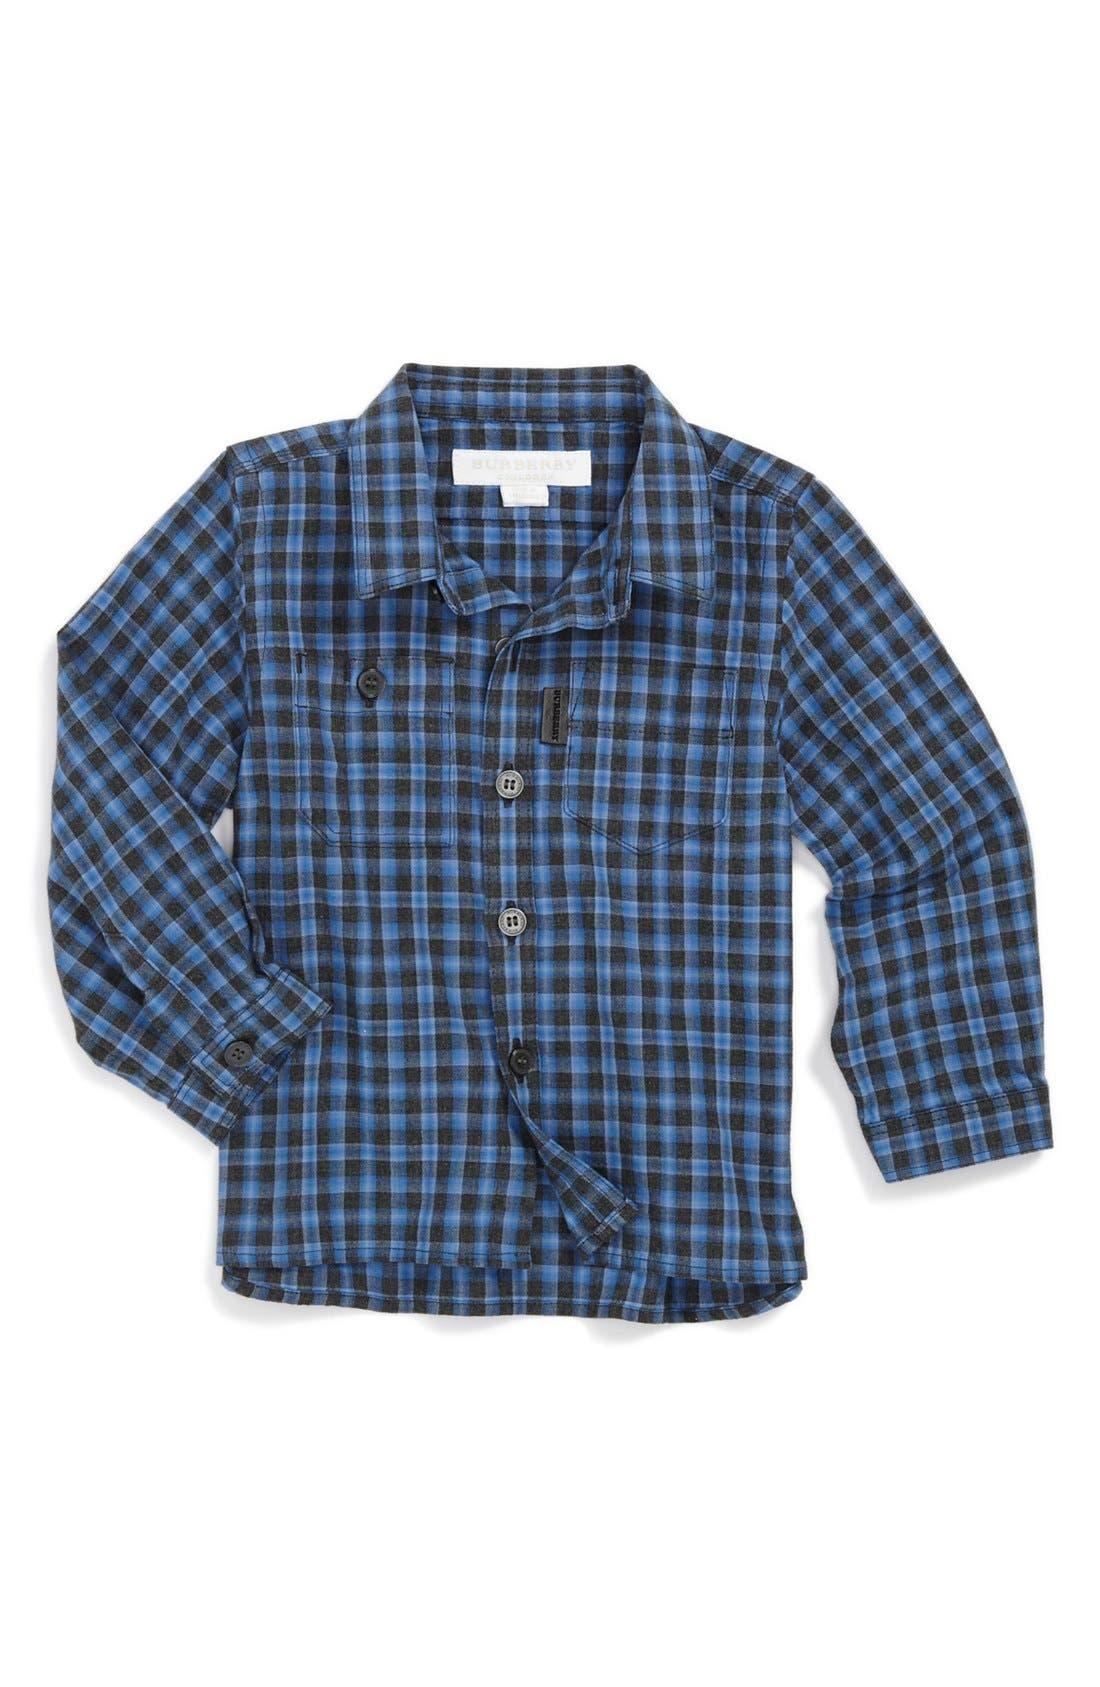 Main Image - Burberry Dress Shirt (Baby Boys)